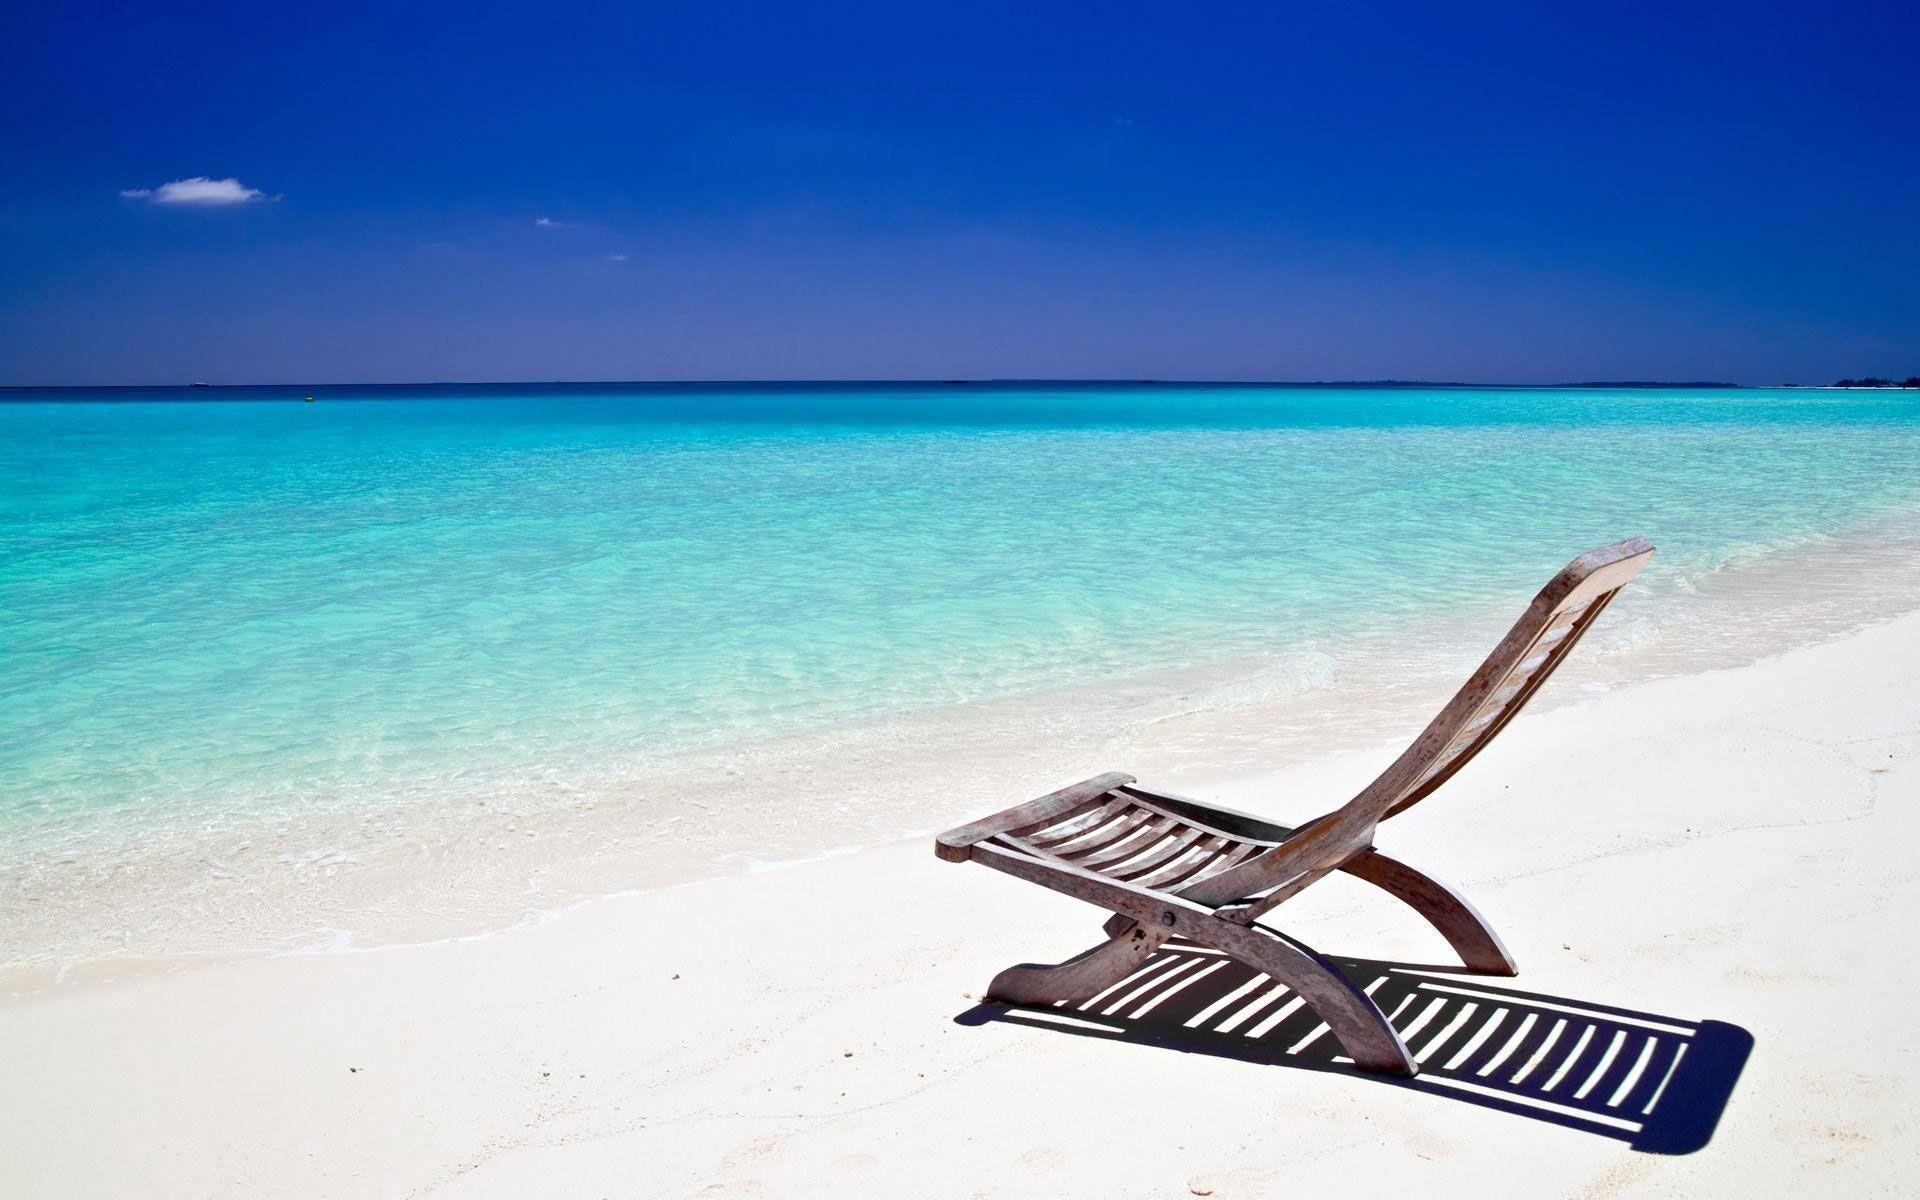 Umbrella beach chairs sun 1366×768 iwallhd wallpaper hd | Download Wallpaper  | Pinterest | Beach chairs and Wallpaper